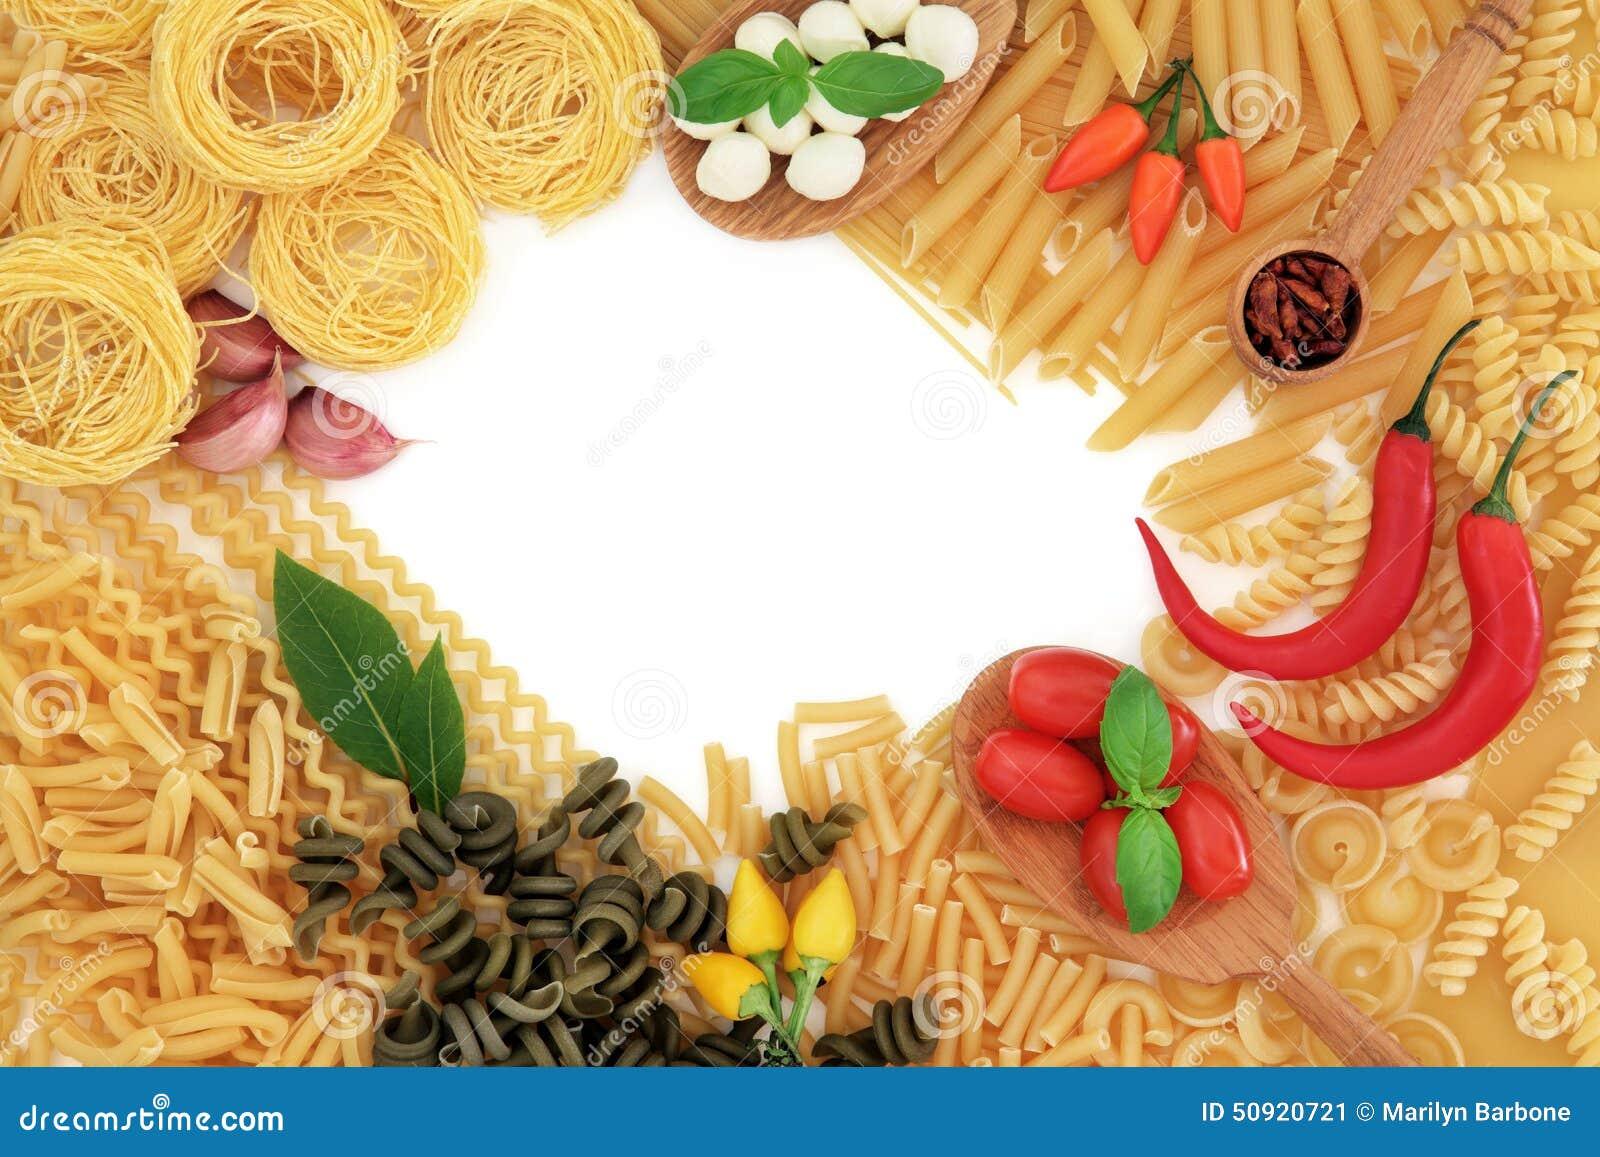 Italian food ingredients stock image image of italian 50920721 italian food ingredients forumfinder Gallery